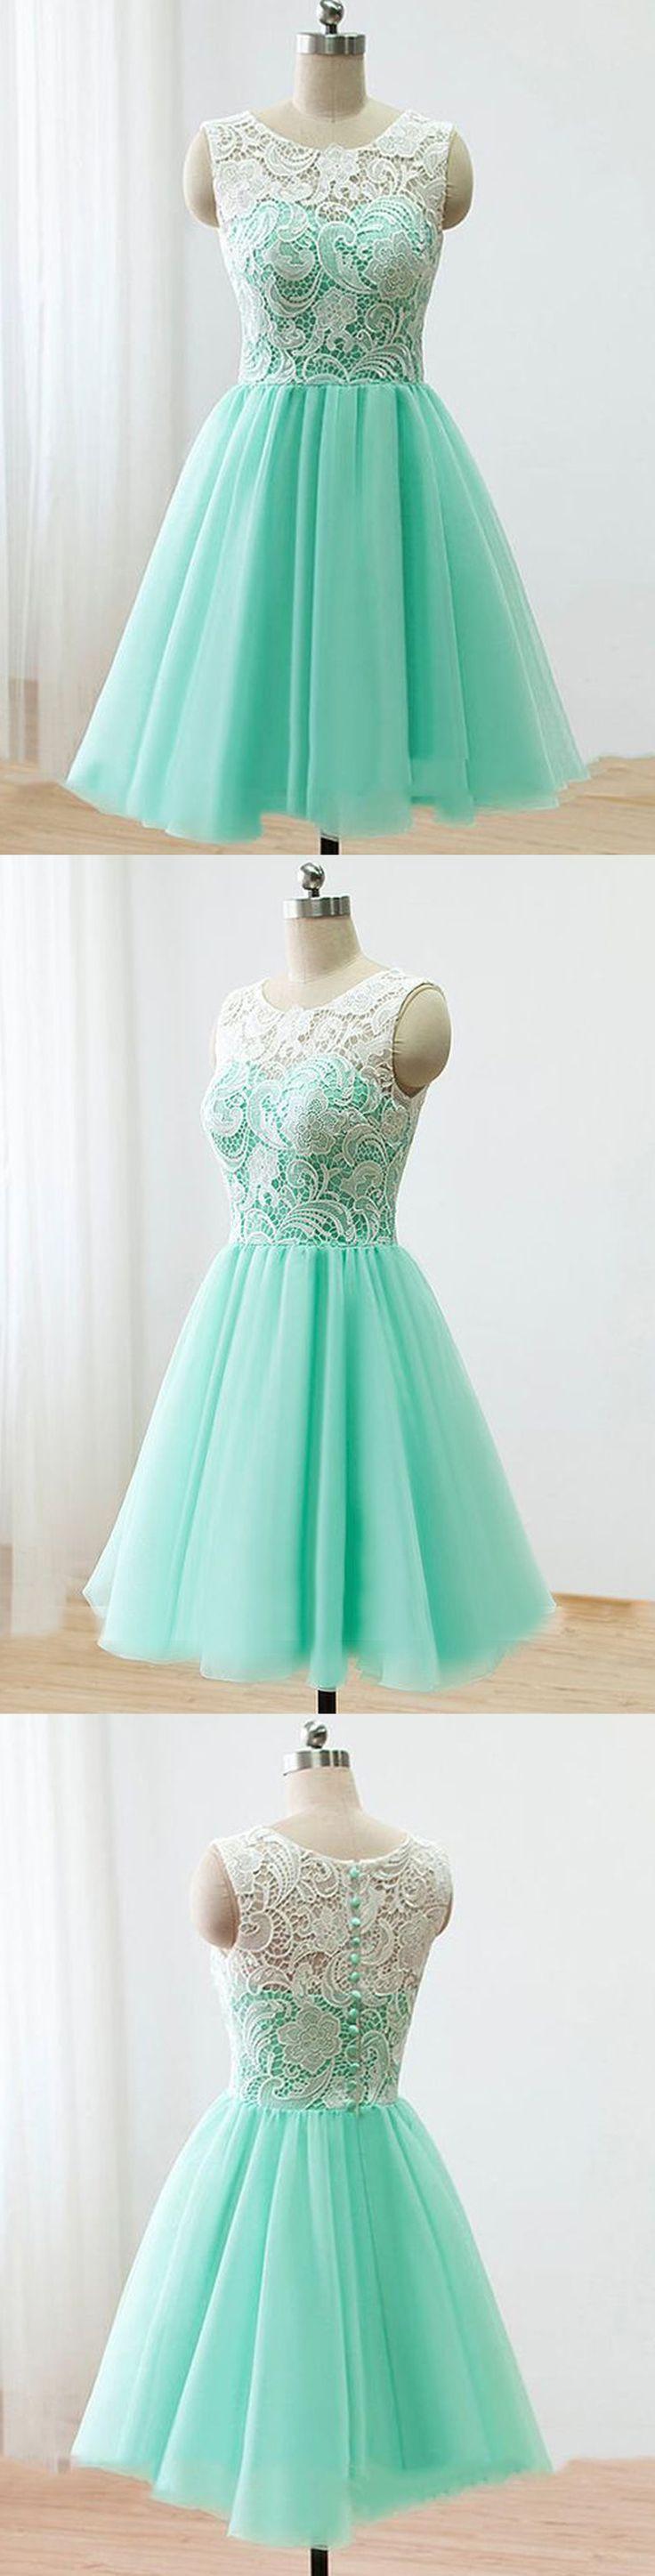 A-Line Homecoming Dresses,Jewel Homecoming Dresses,Short Homecoming Dresses,Mint Green Homecoming Dresses,Chiffon Homecoming Dresses,Lace Homecoming Dresses,Homecoming Dresses 2017